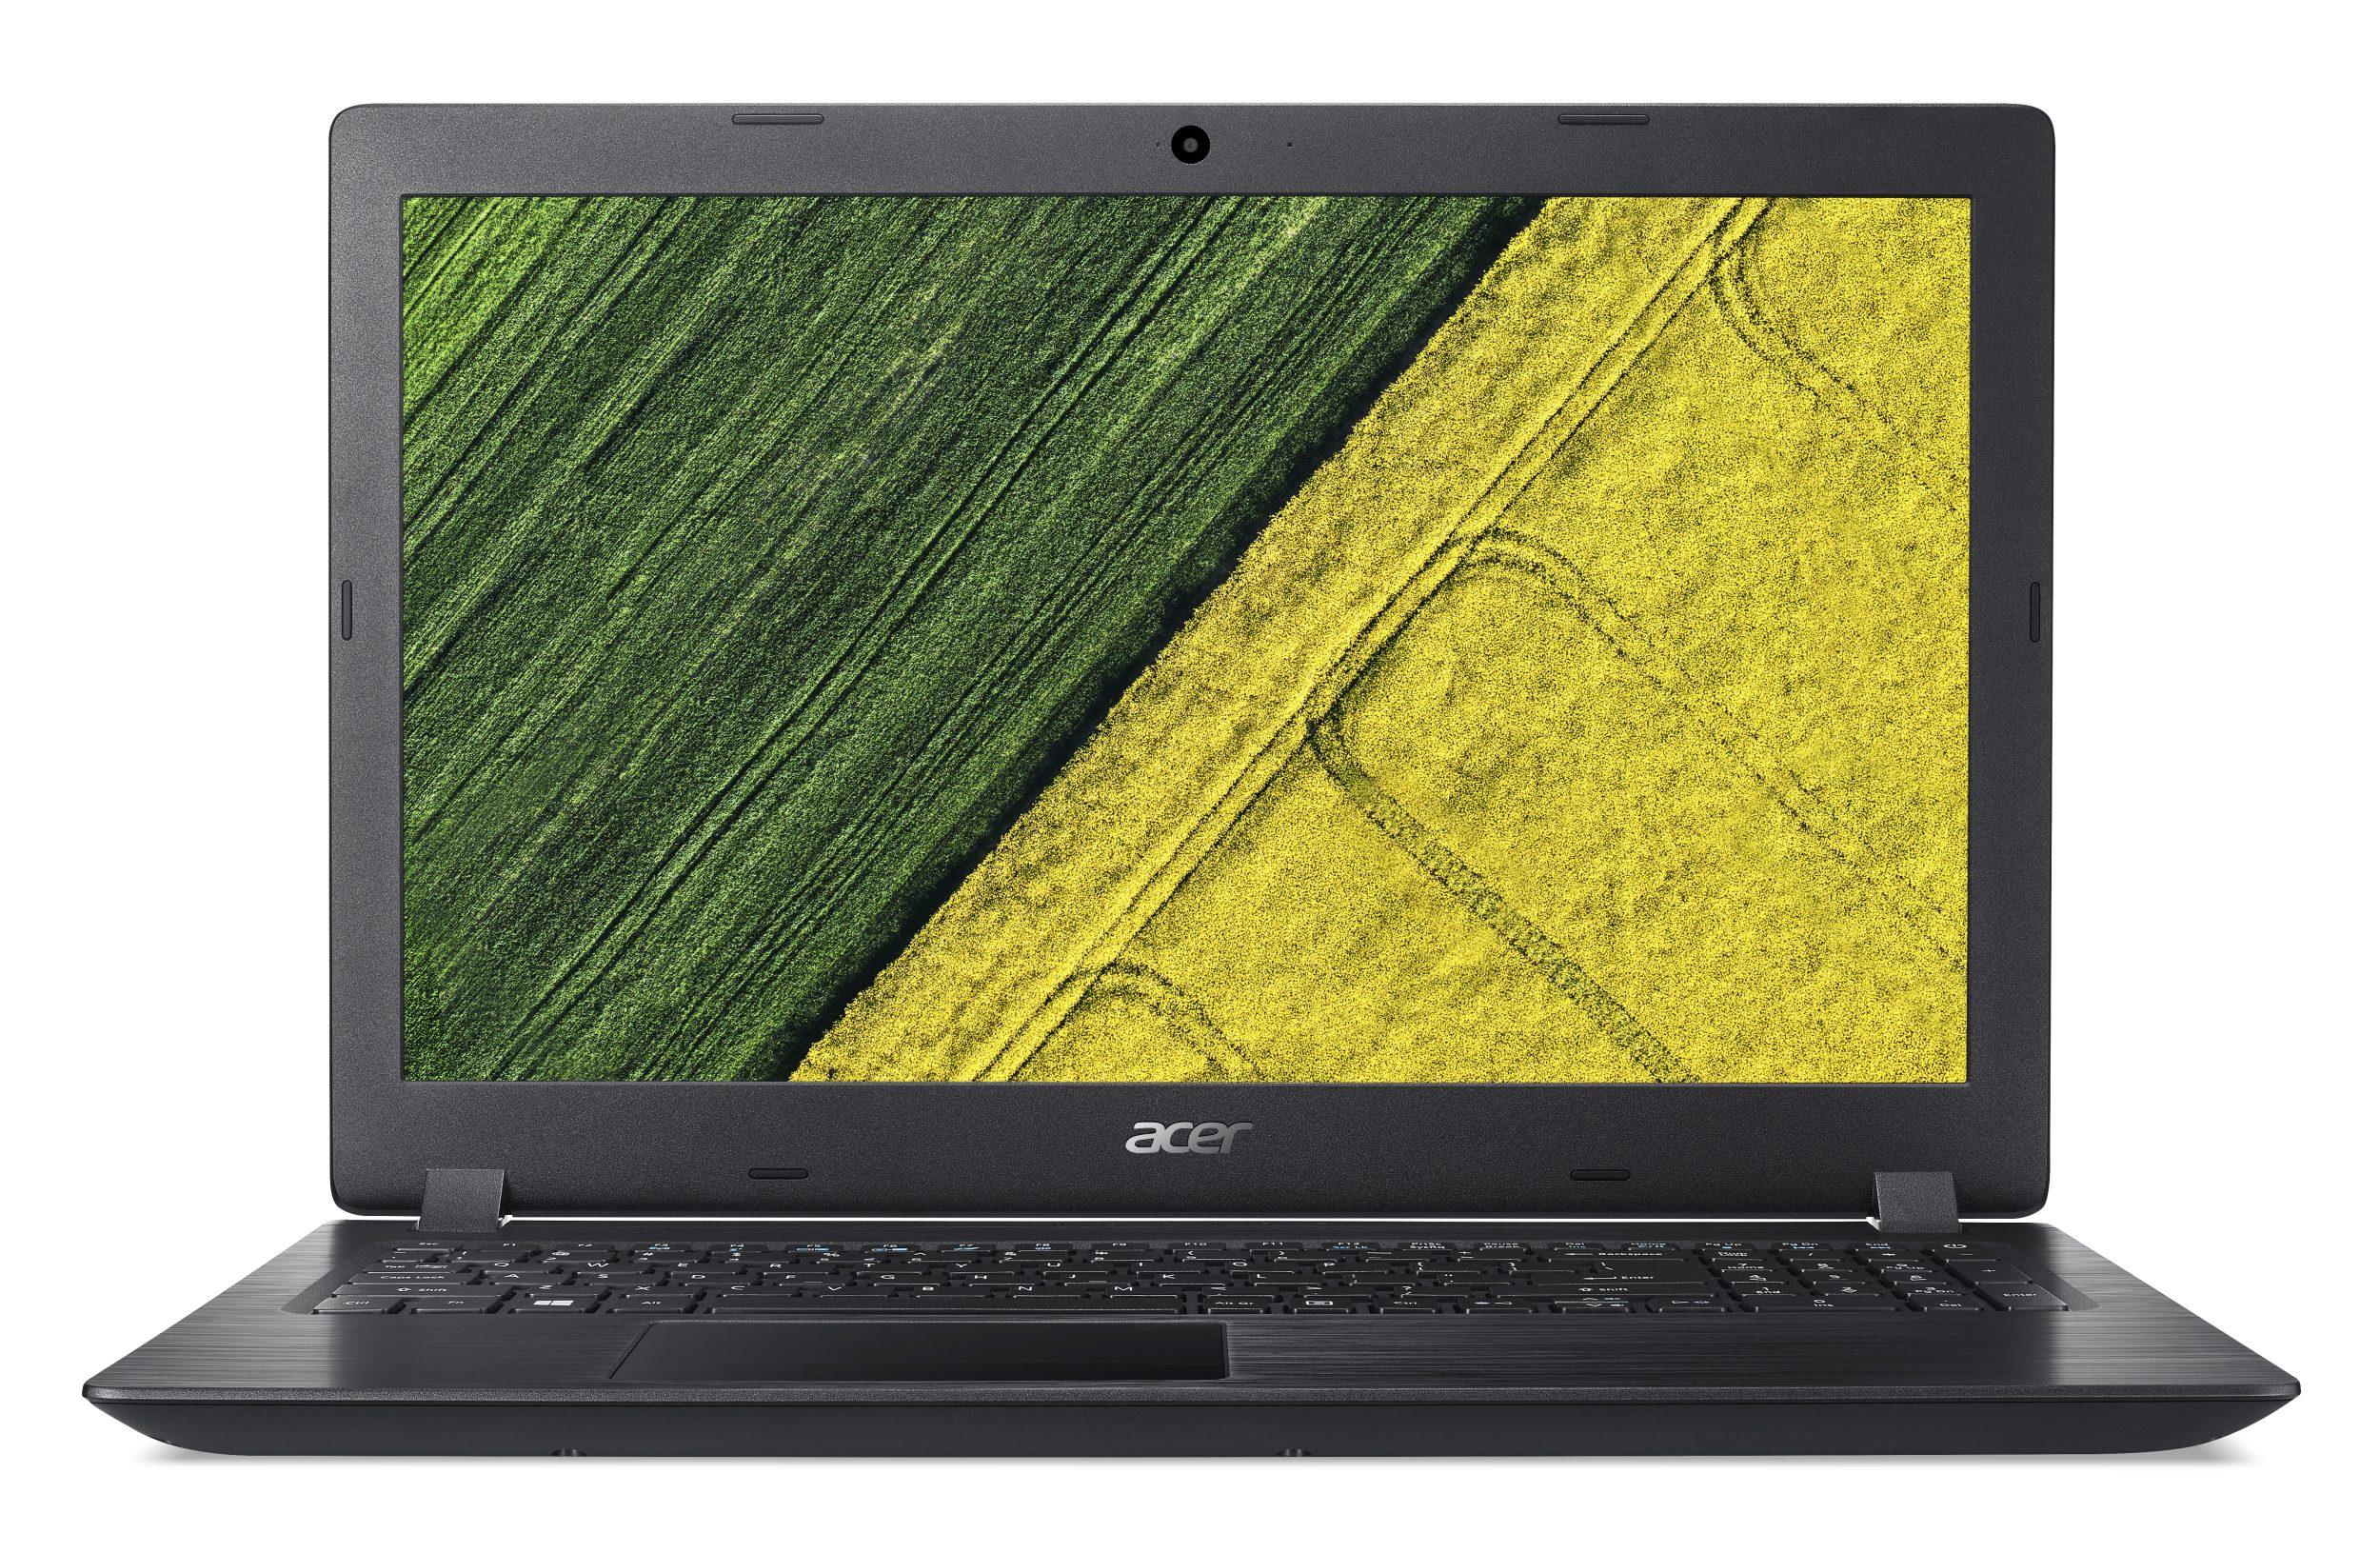 "Acer Aspire 3 (A315-41G-R4PC) AMD Ryzen 5 2500U/8GB+N/256GB SSD M.2+N/AMD Radeon 535 2GB/15.6"" FHD LED matný/BT/W10 Home"